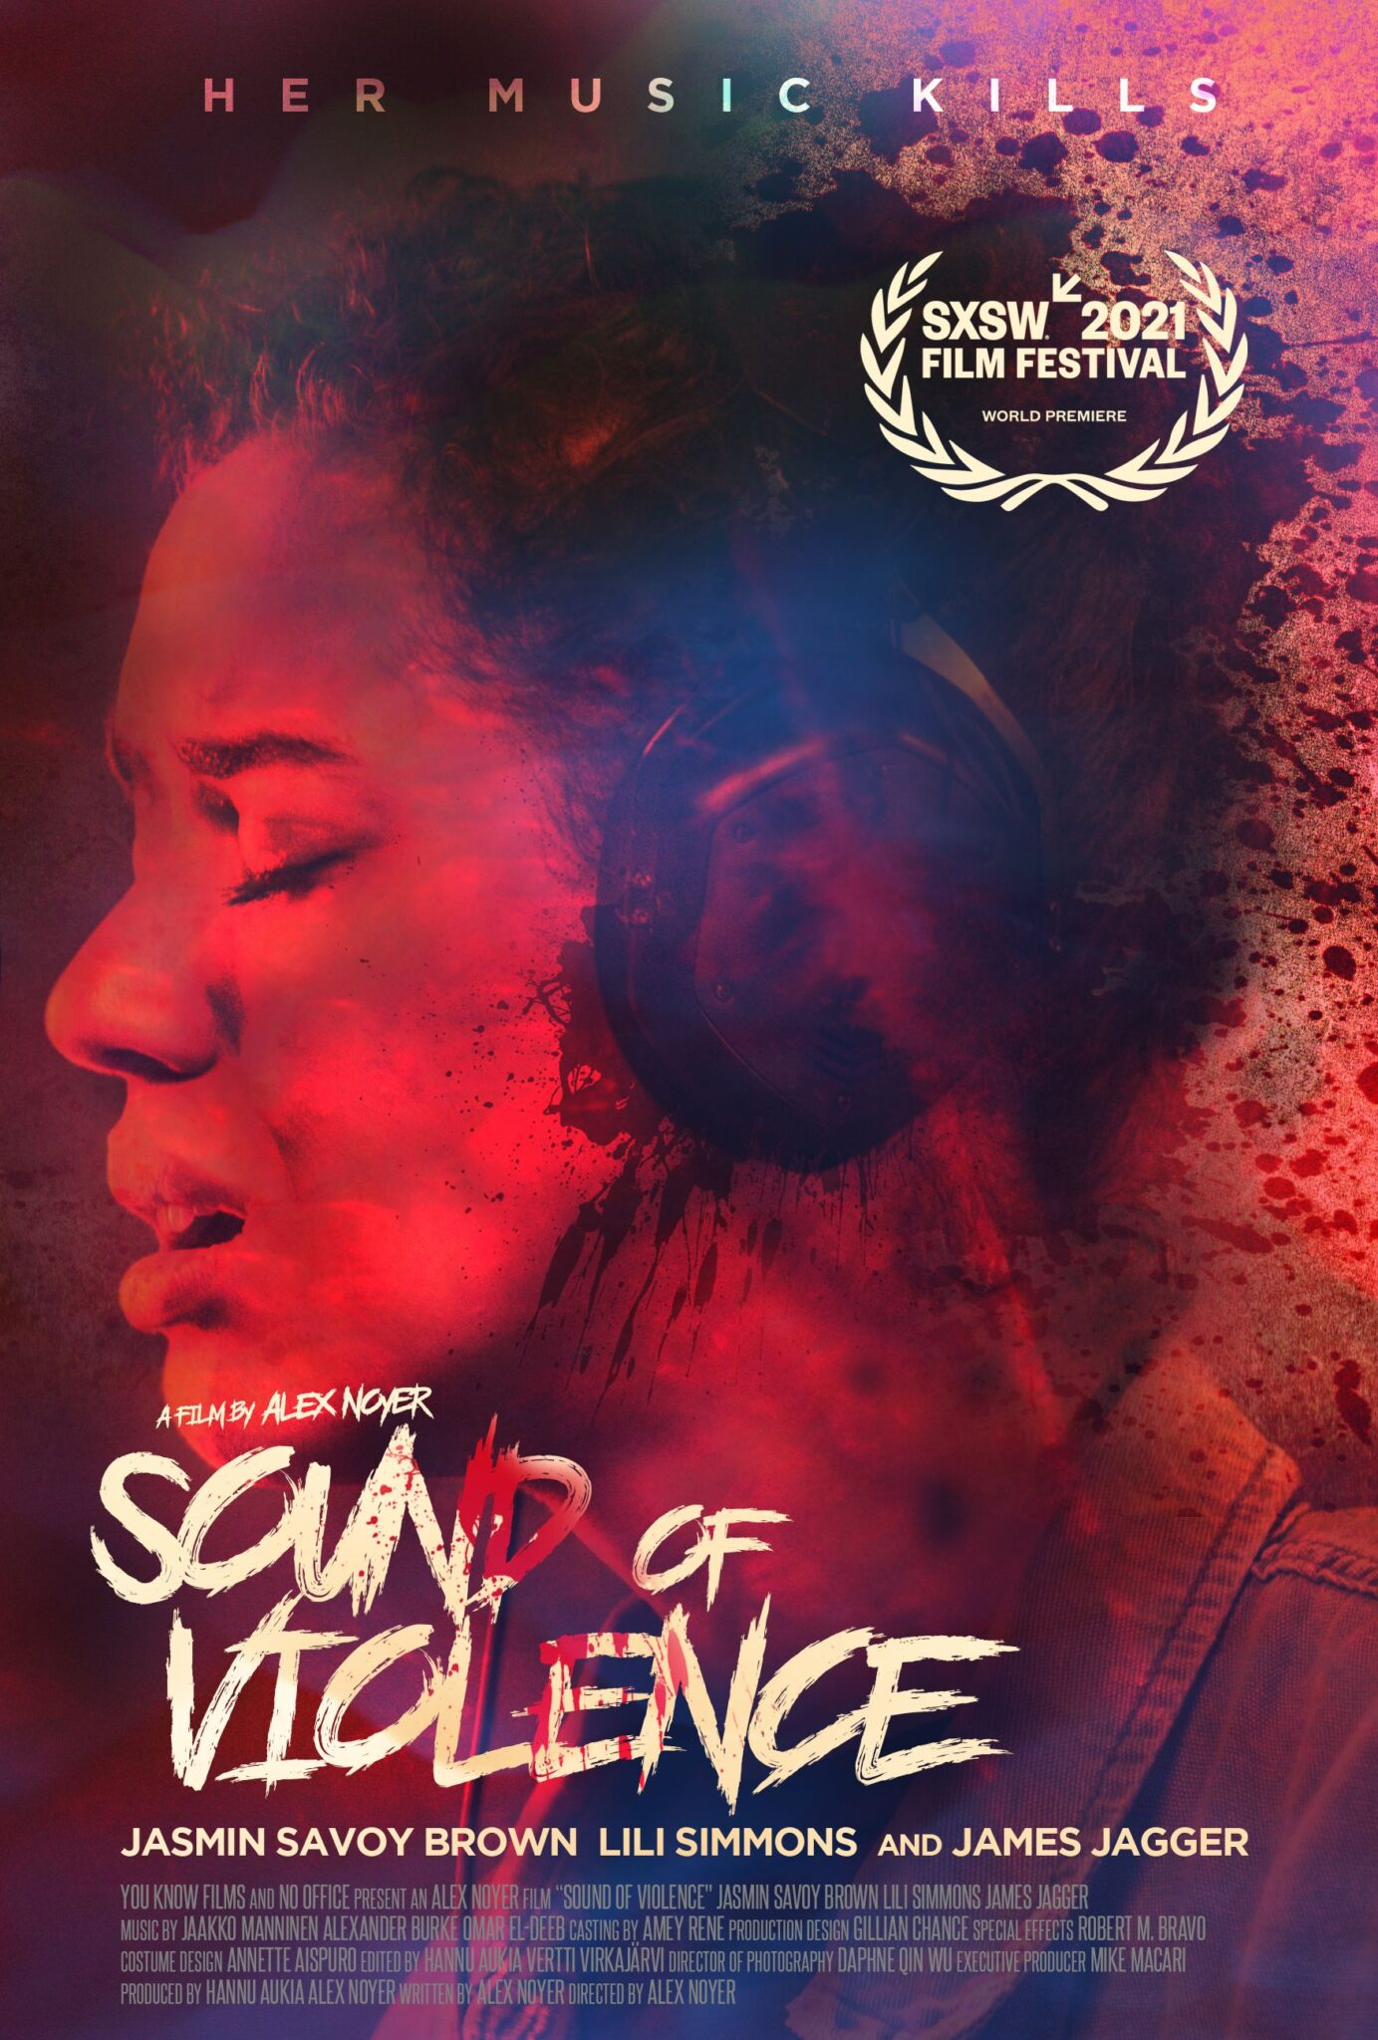 Jasmin Savoy Brown on Sound of Violence poster